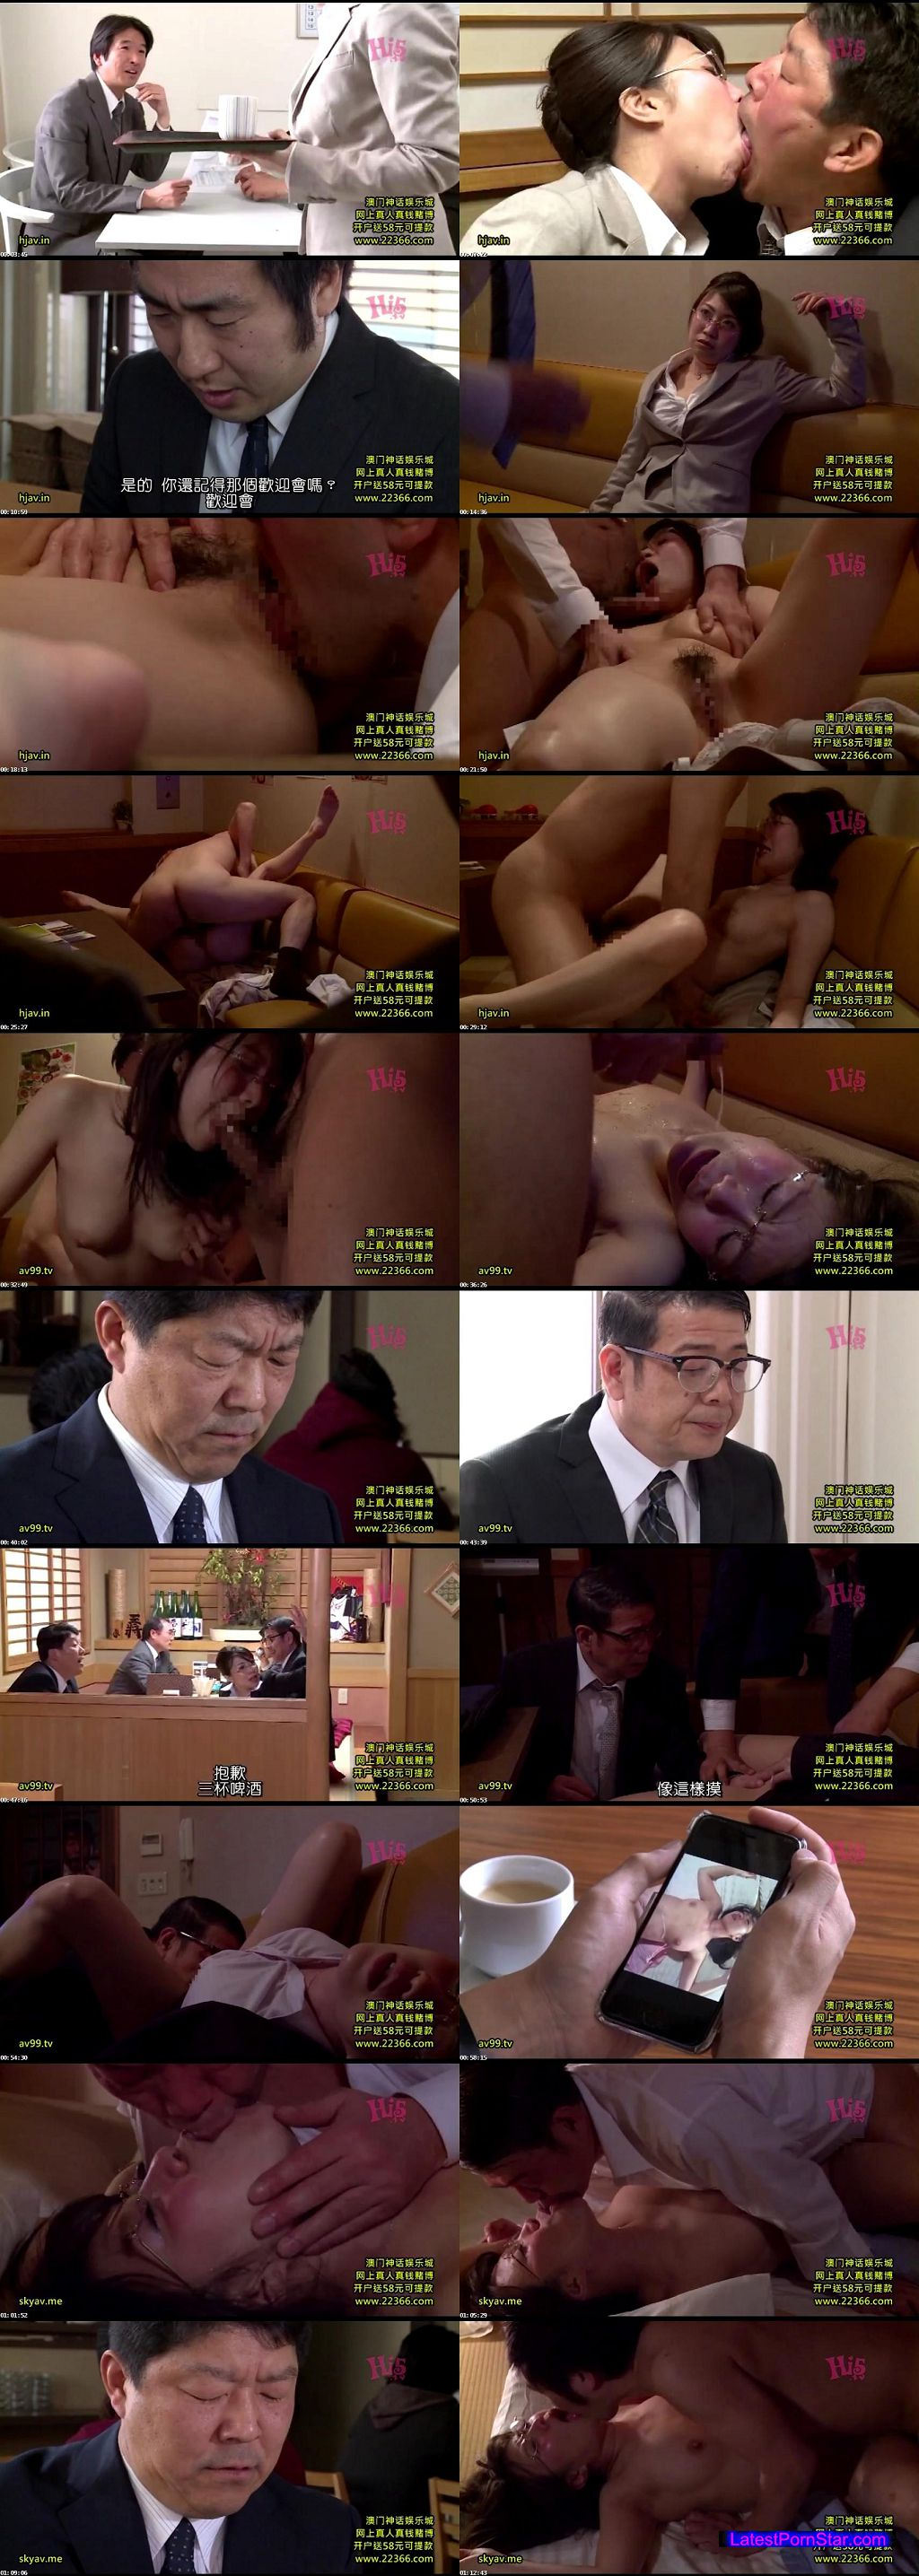 [BNSPS-368] とある会社社長の寝取られ願望… 社員全員と関係をもってしまった妻 上野菜穂